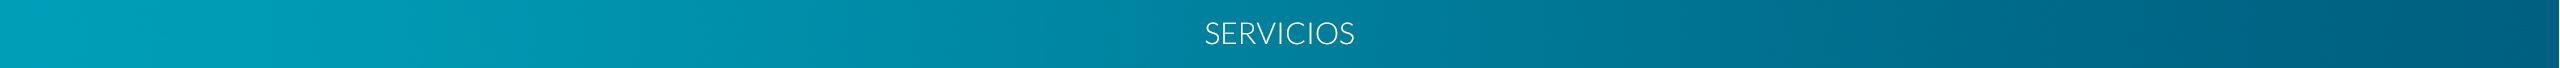 NETSTERIL título franja servicios